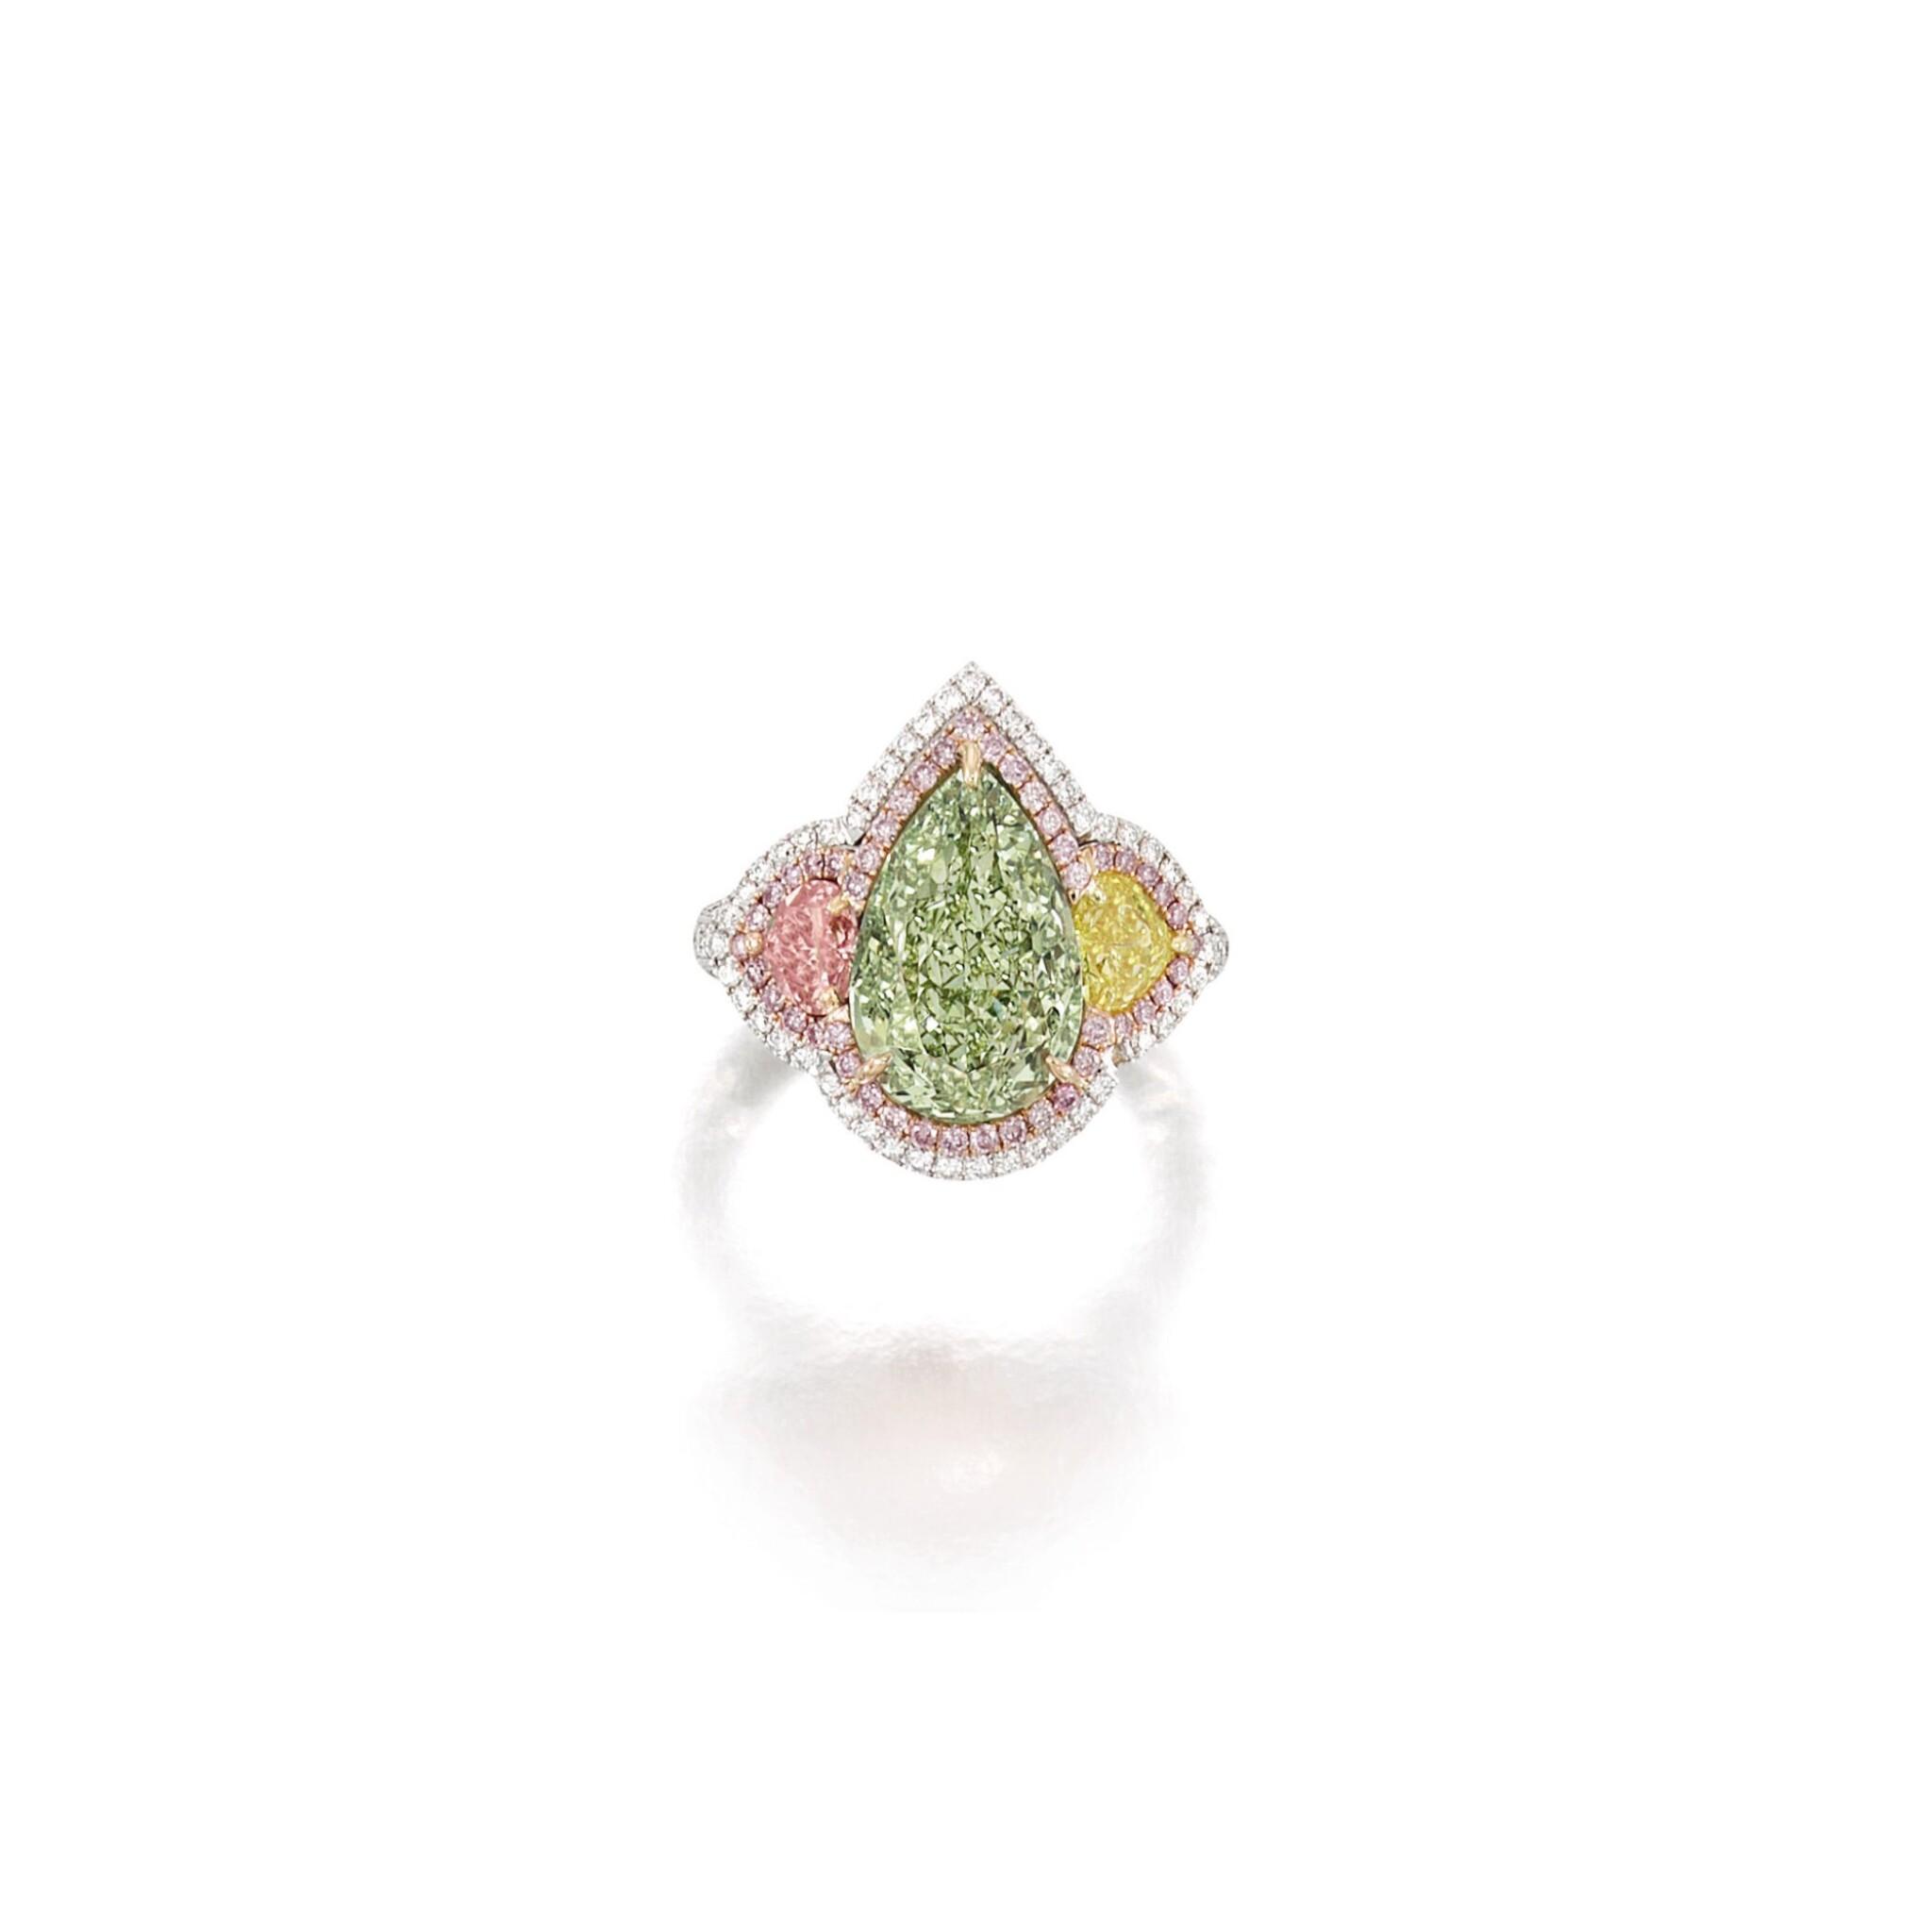 View full screen - View 1 of Lot 1652.  FANCY YELLOW-GREEN DIAMOND, FANCY COLOURED DIAMOND AND DIAMOND RING    5.00卡拉 梨形 彩黃綠色 VS2淨度 鑽石 配 彩色鑽石 及 鑽石 戒指.